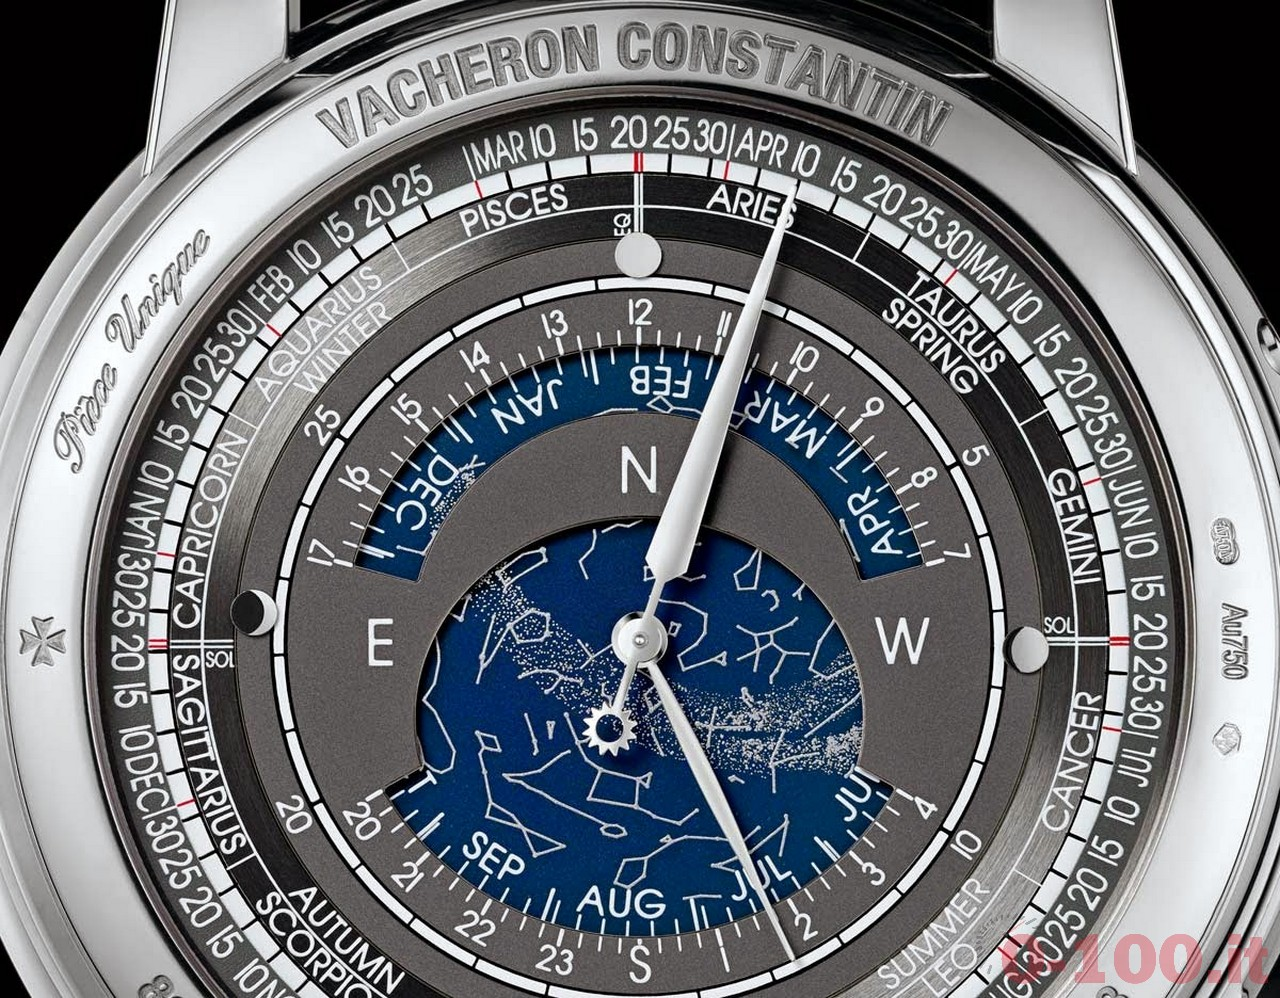 watcheswonders-2014-vacheron-constantin-maitre-cabinotier-astronomica-one-off-prezzo-price-0-100_8